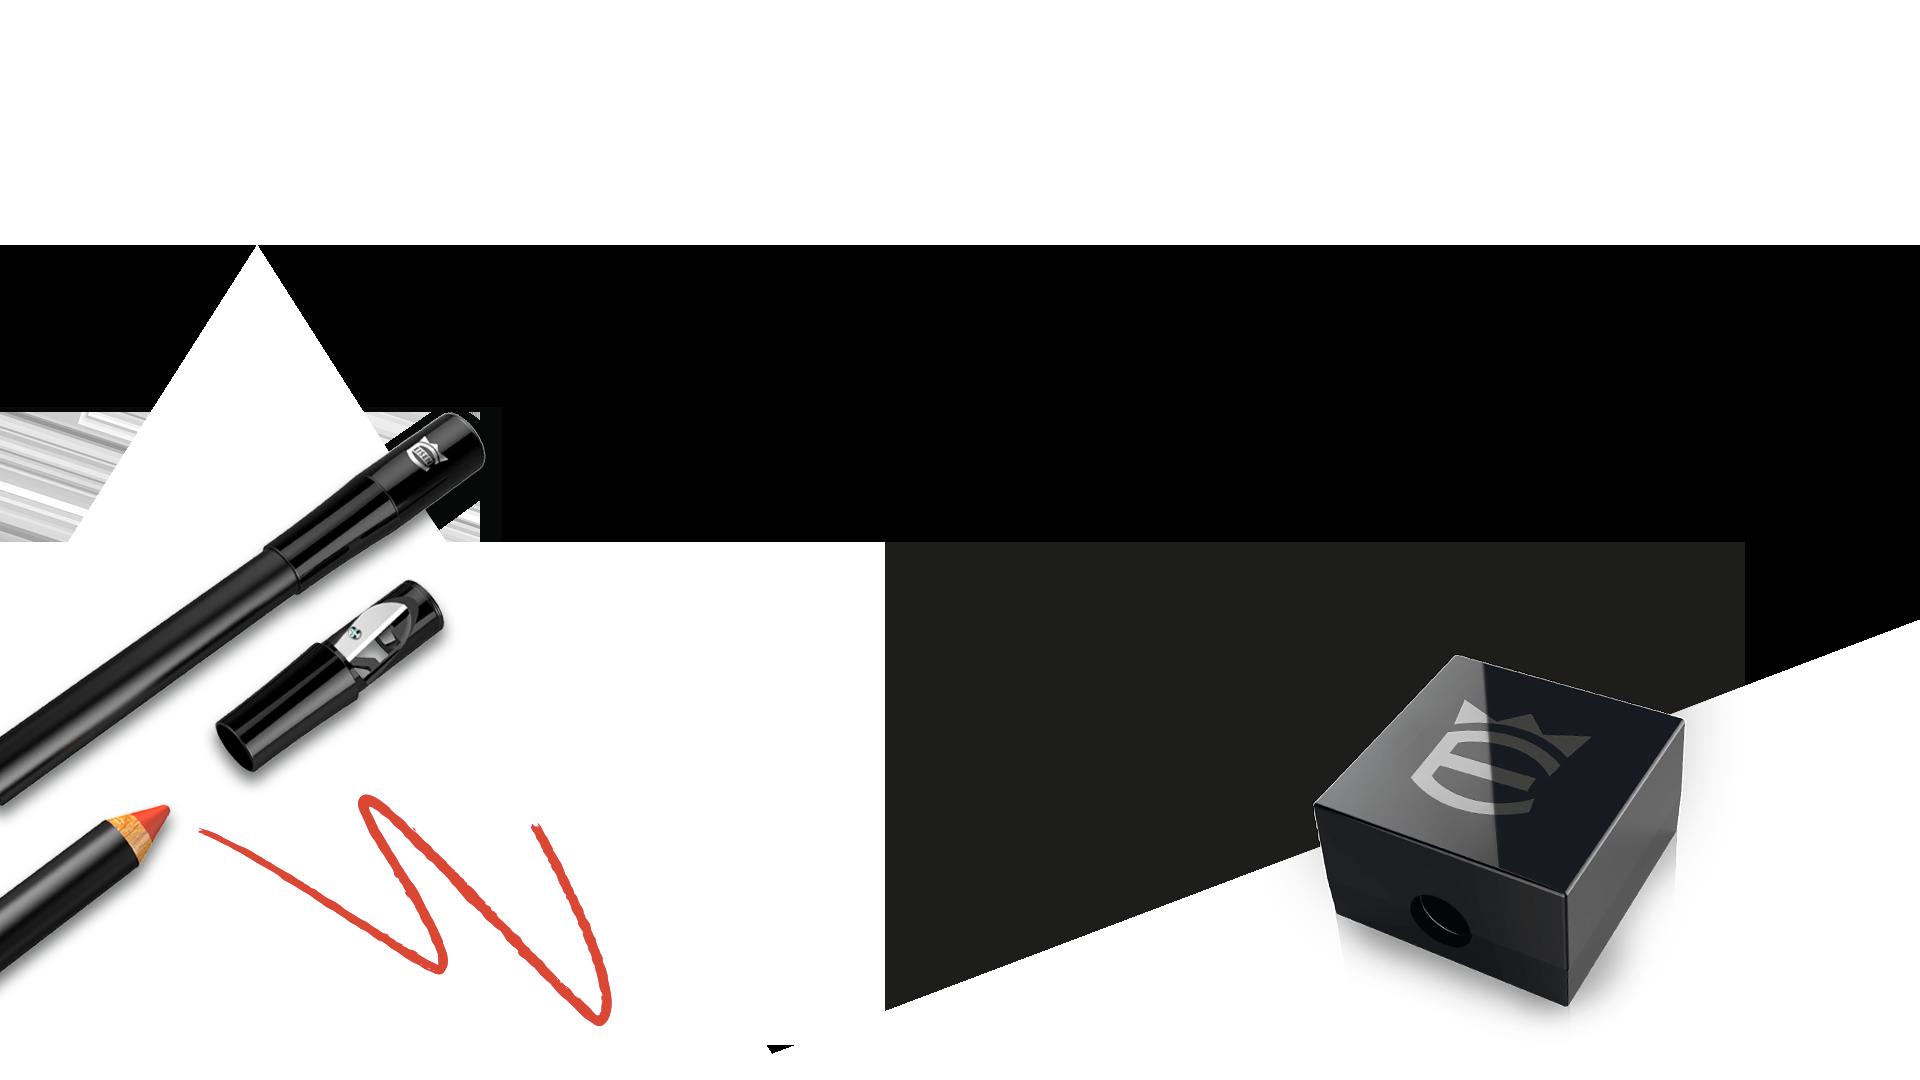 Eisen cosmetic sharpener